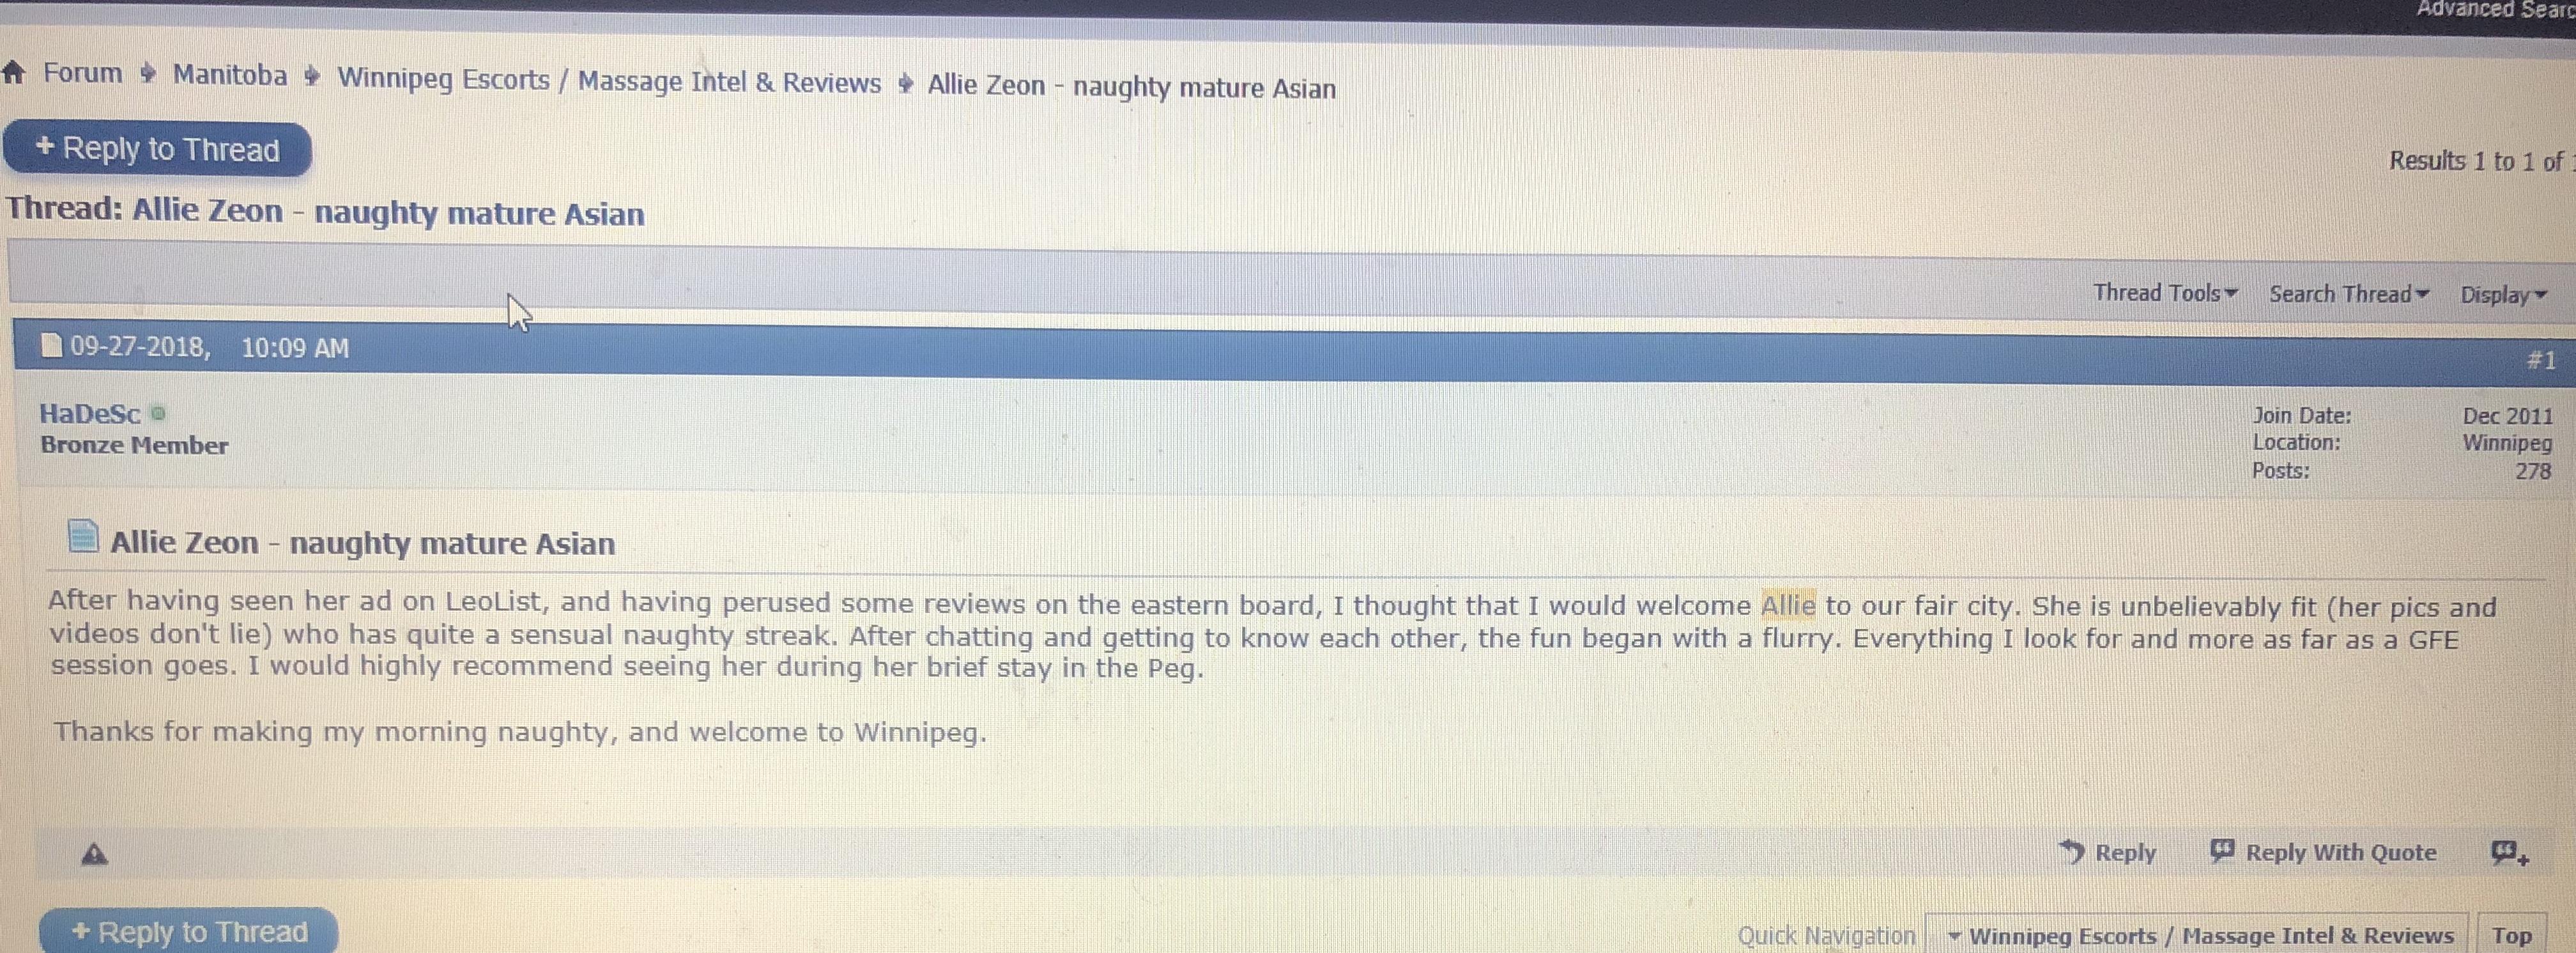 asiatico dating Winnipeg Manitoba